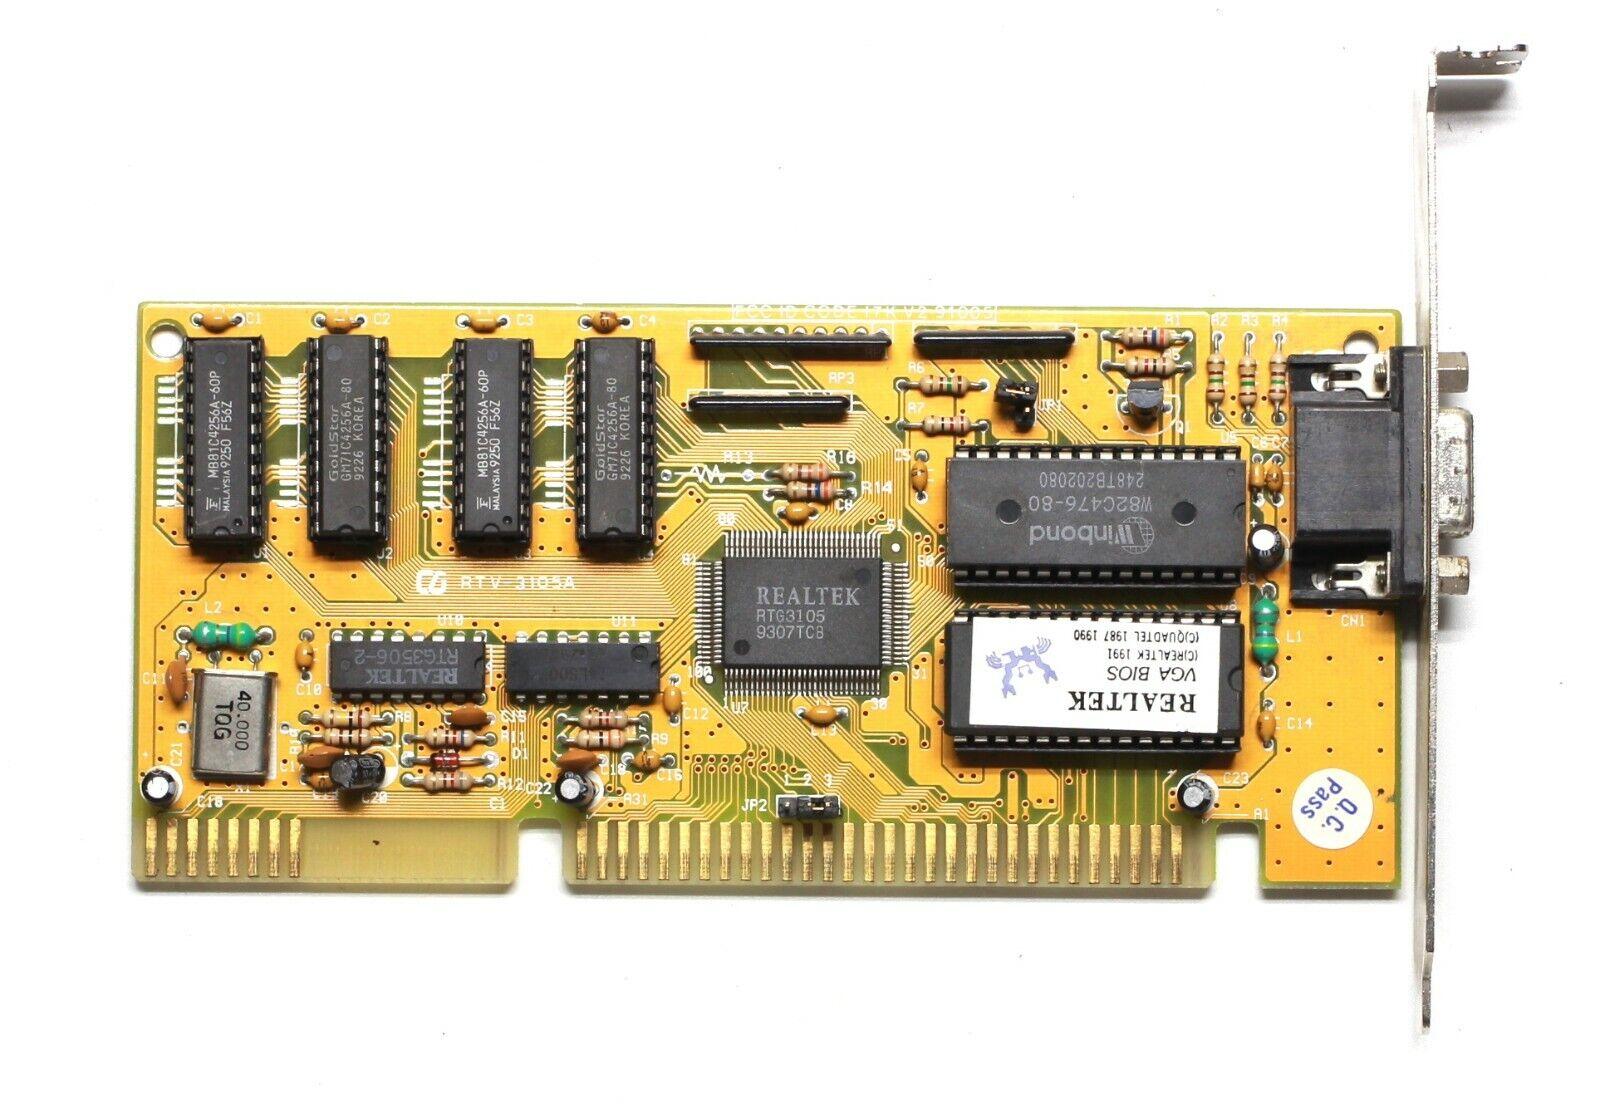 ISA video card - Realtek RTG3105 - 512KB - TESTED